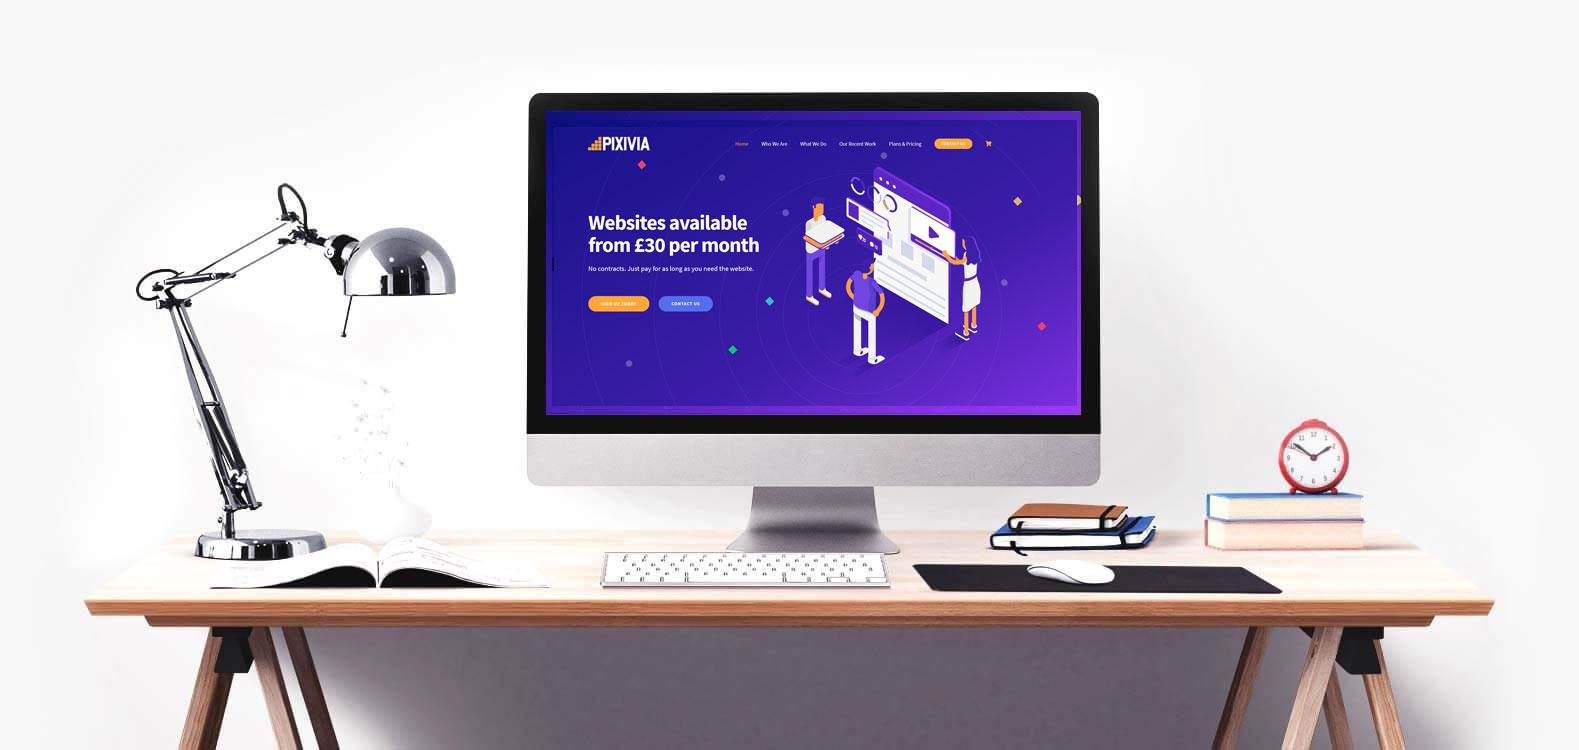 Pixivia Web Design Agency